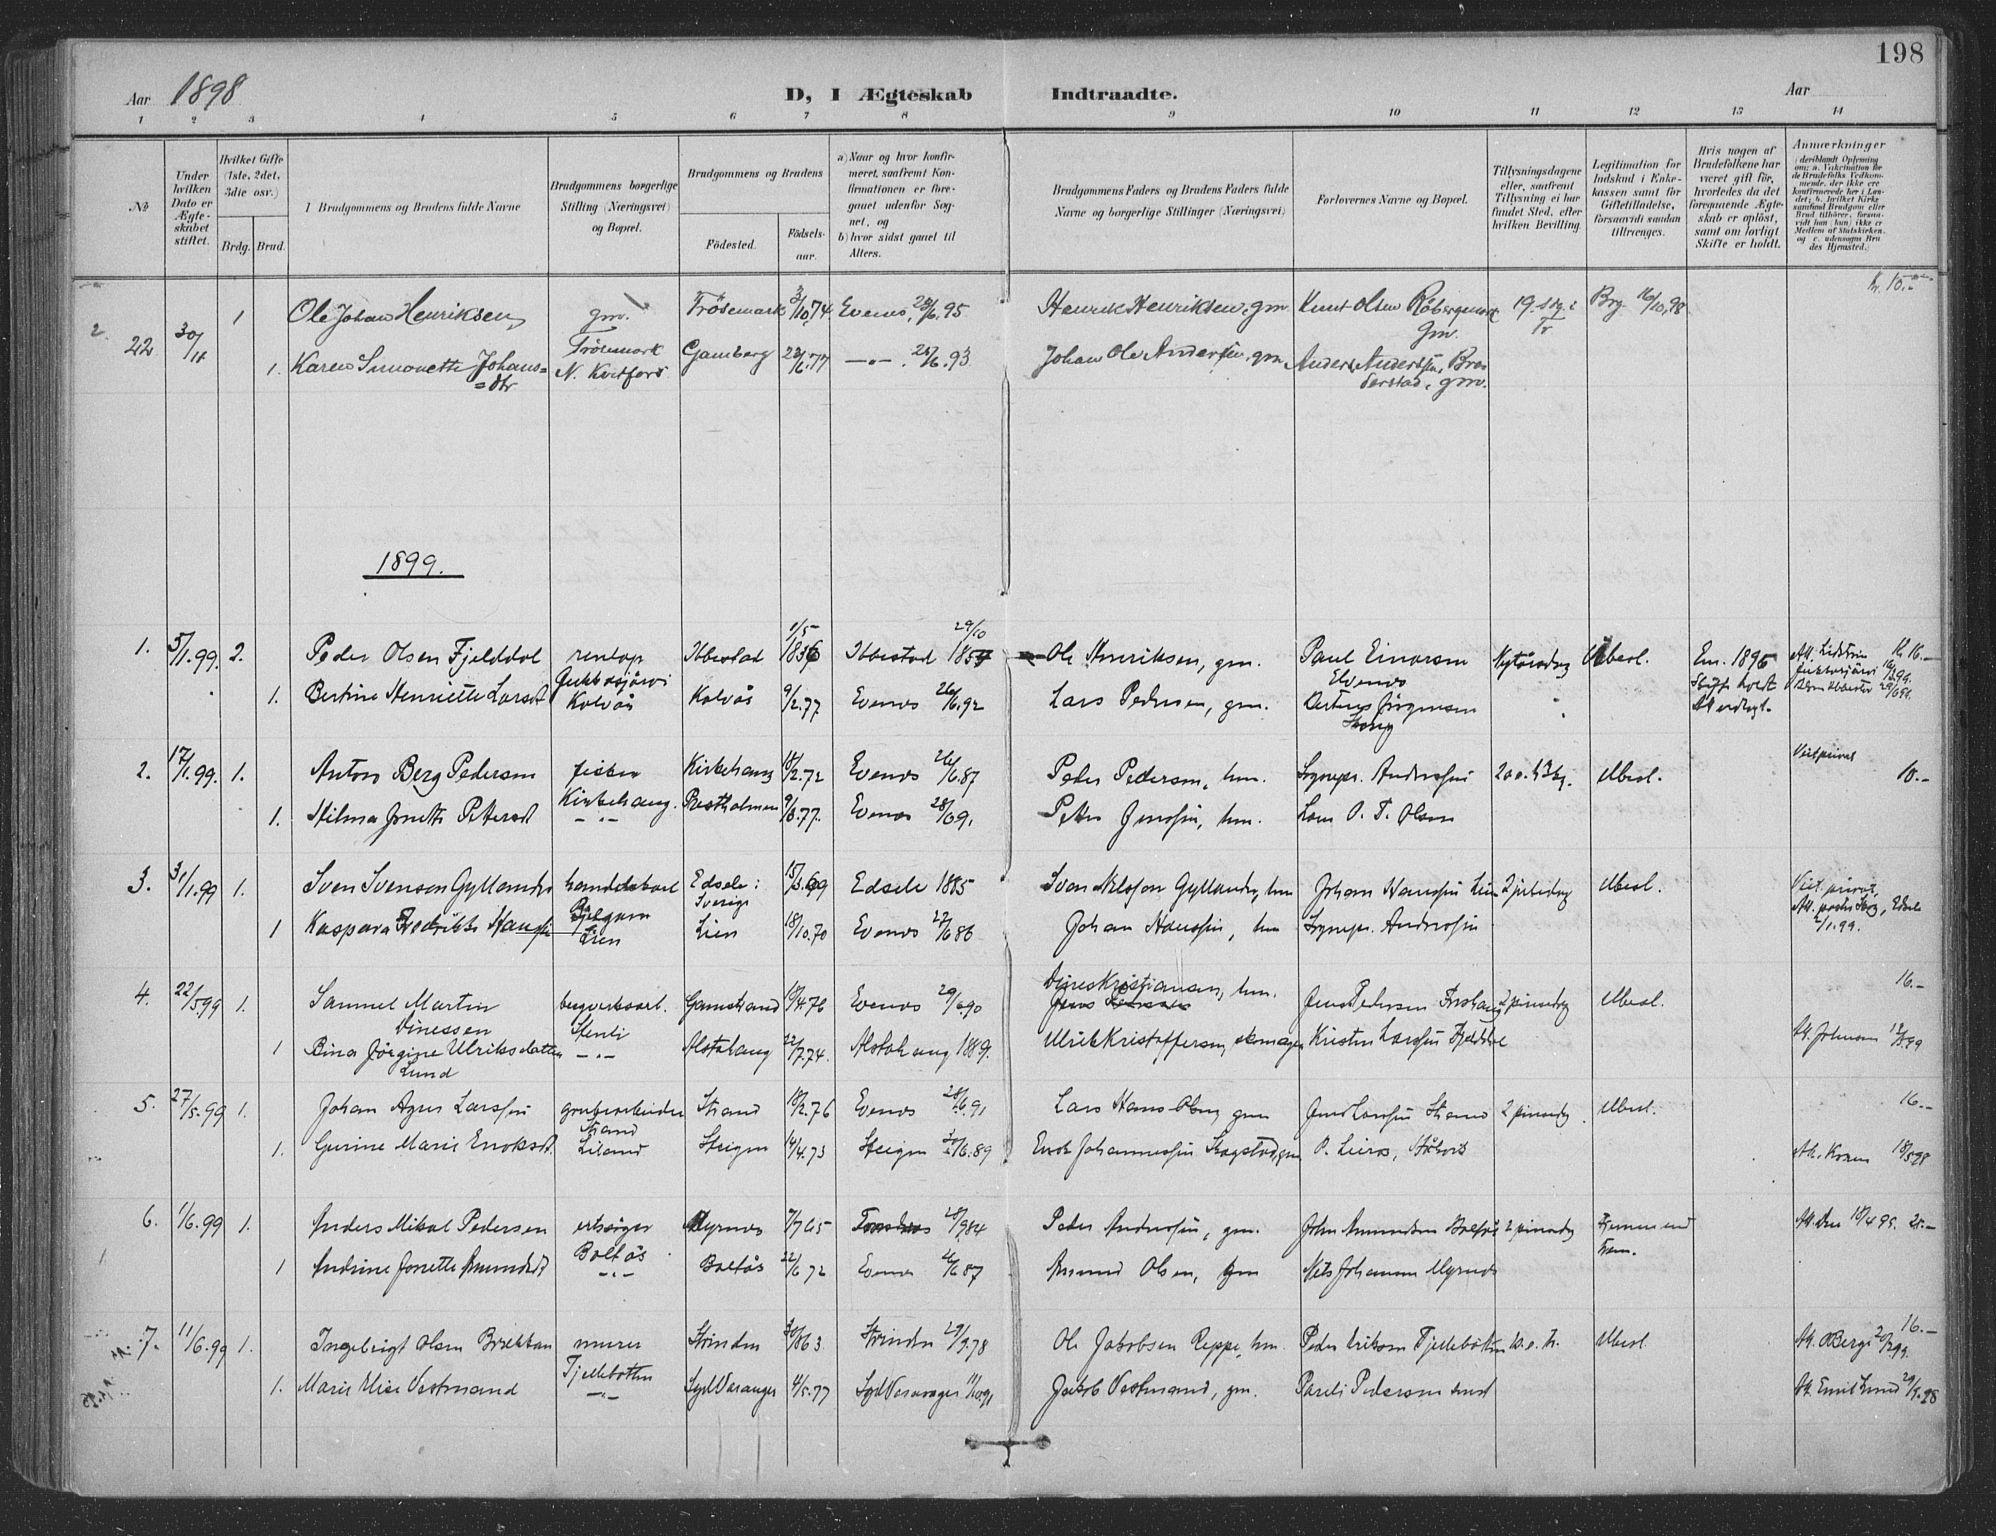 SAT, Ministerialprotokoller, klokkerbøker og fødselsregistre - Nordland, 863/L0899: Ministerialbok nr. 863A11, 1897-1906, s. 198